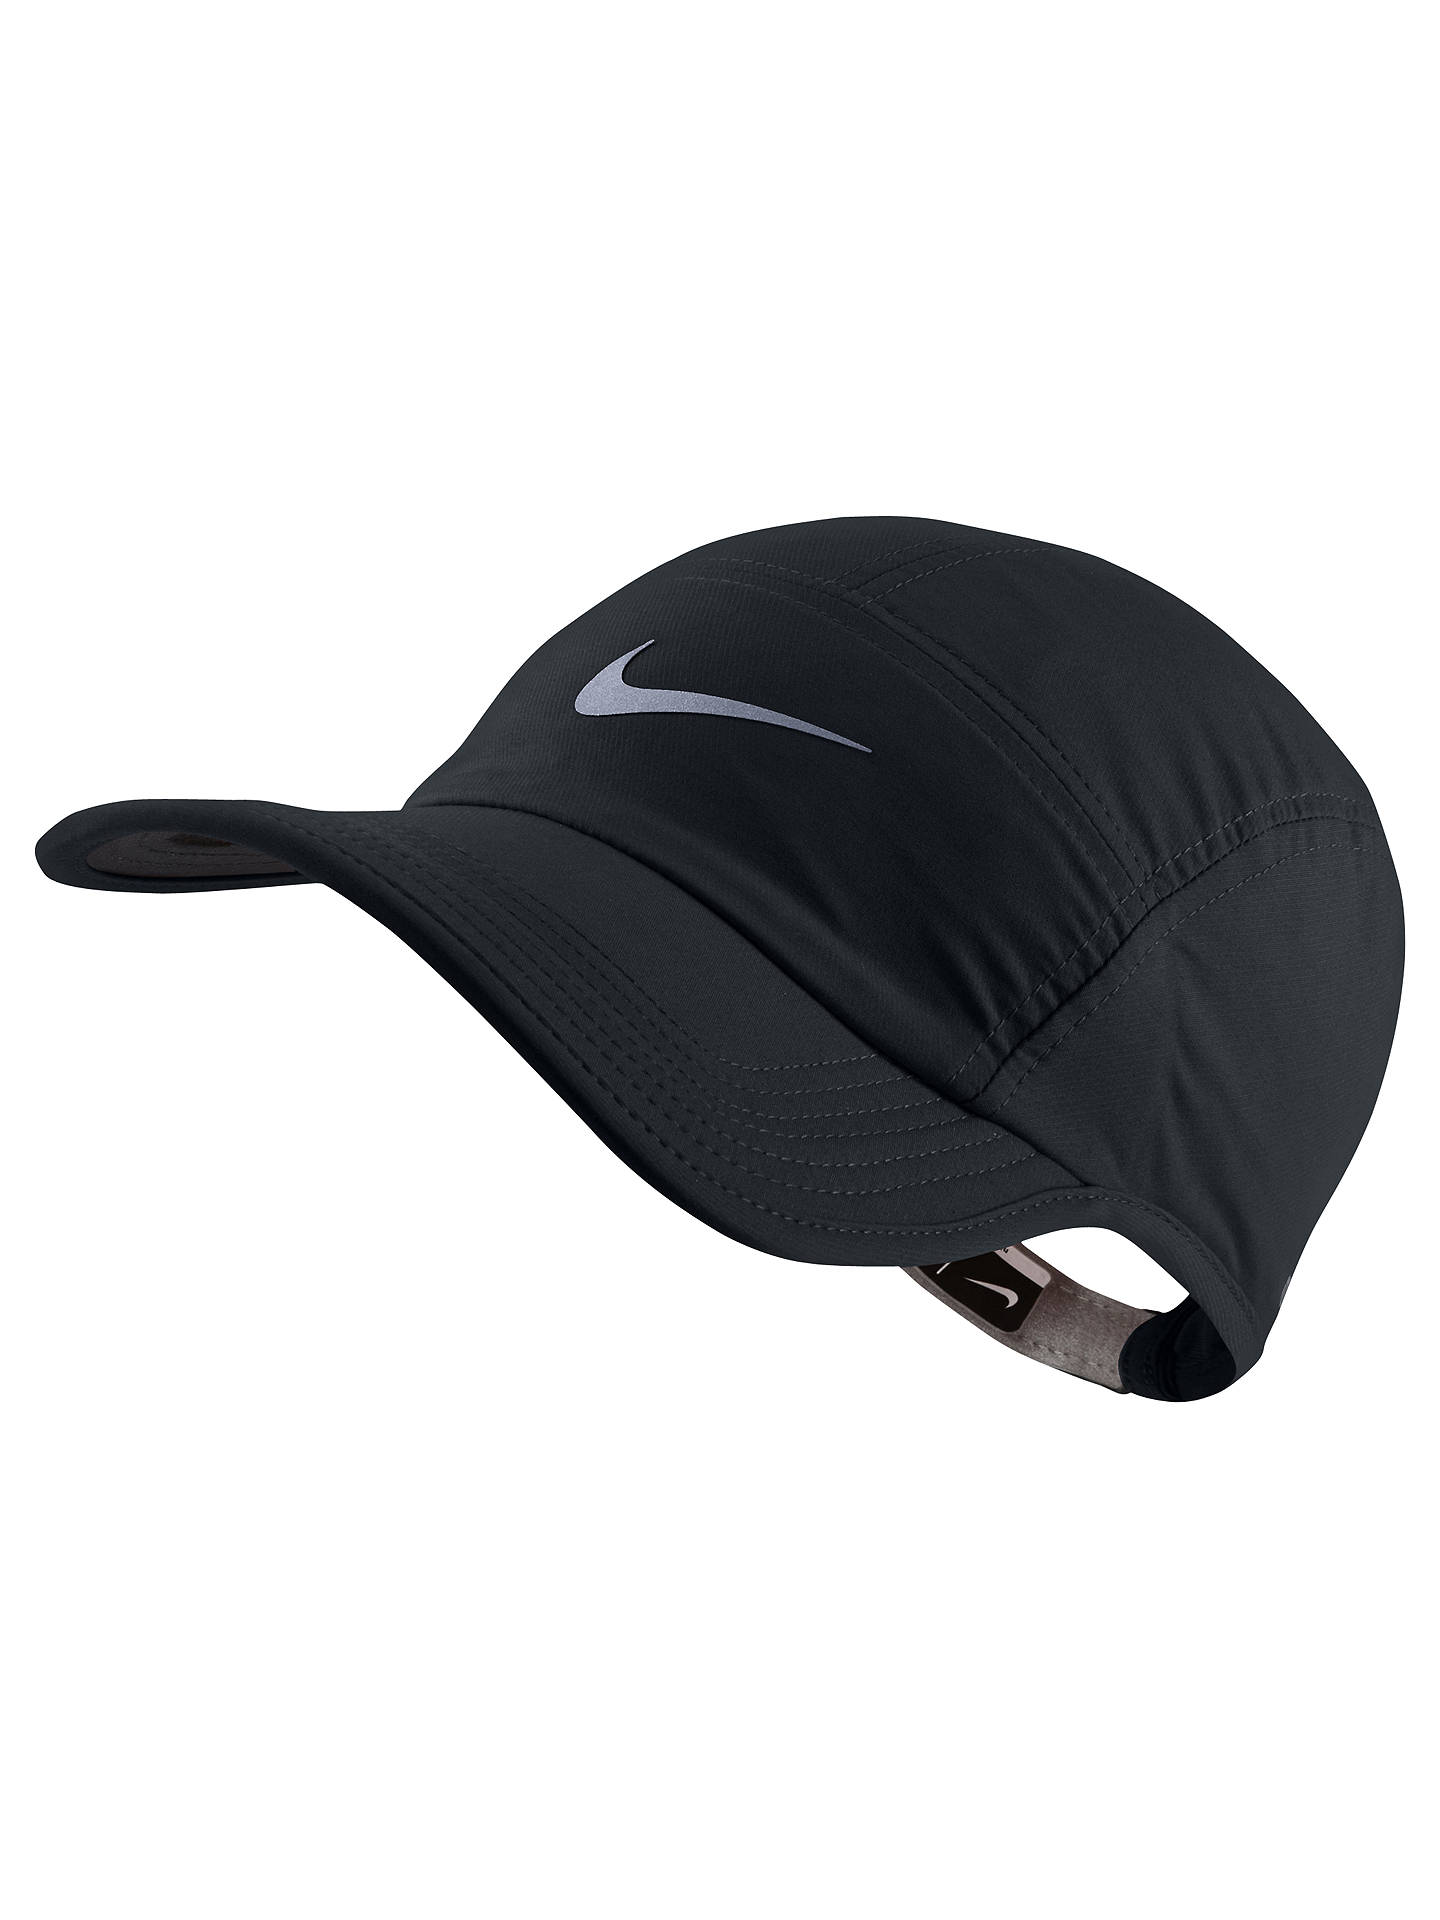 ceabc55742ee4 ... order buynike aw84 adjustable running hat black online at johnlewis  21ebf 759c0